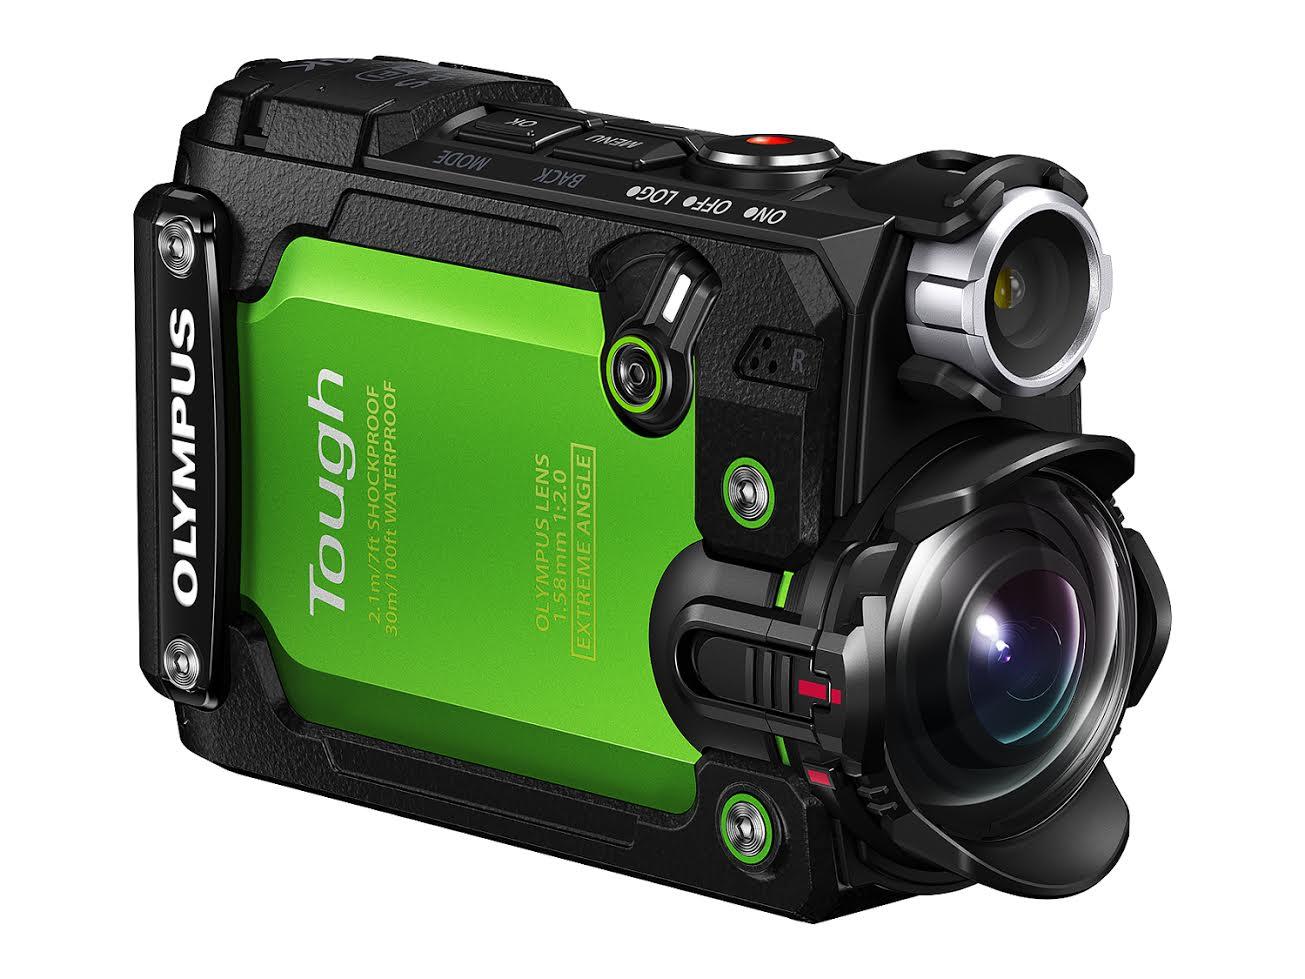 Olympus 首款運動相機 Stylus TG-Tracker 登場,主打運動與潛水的硬派風